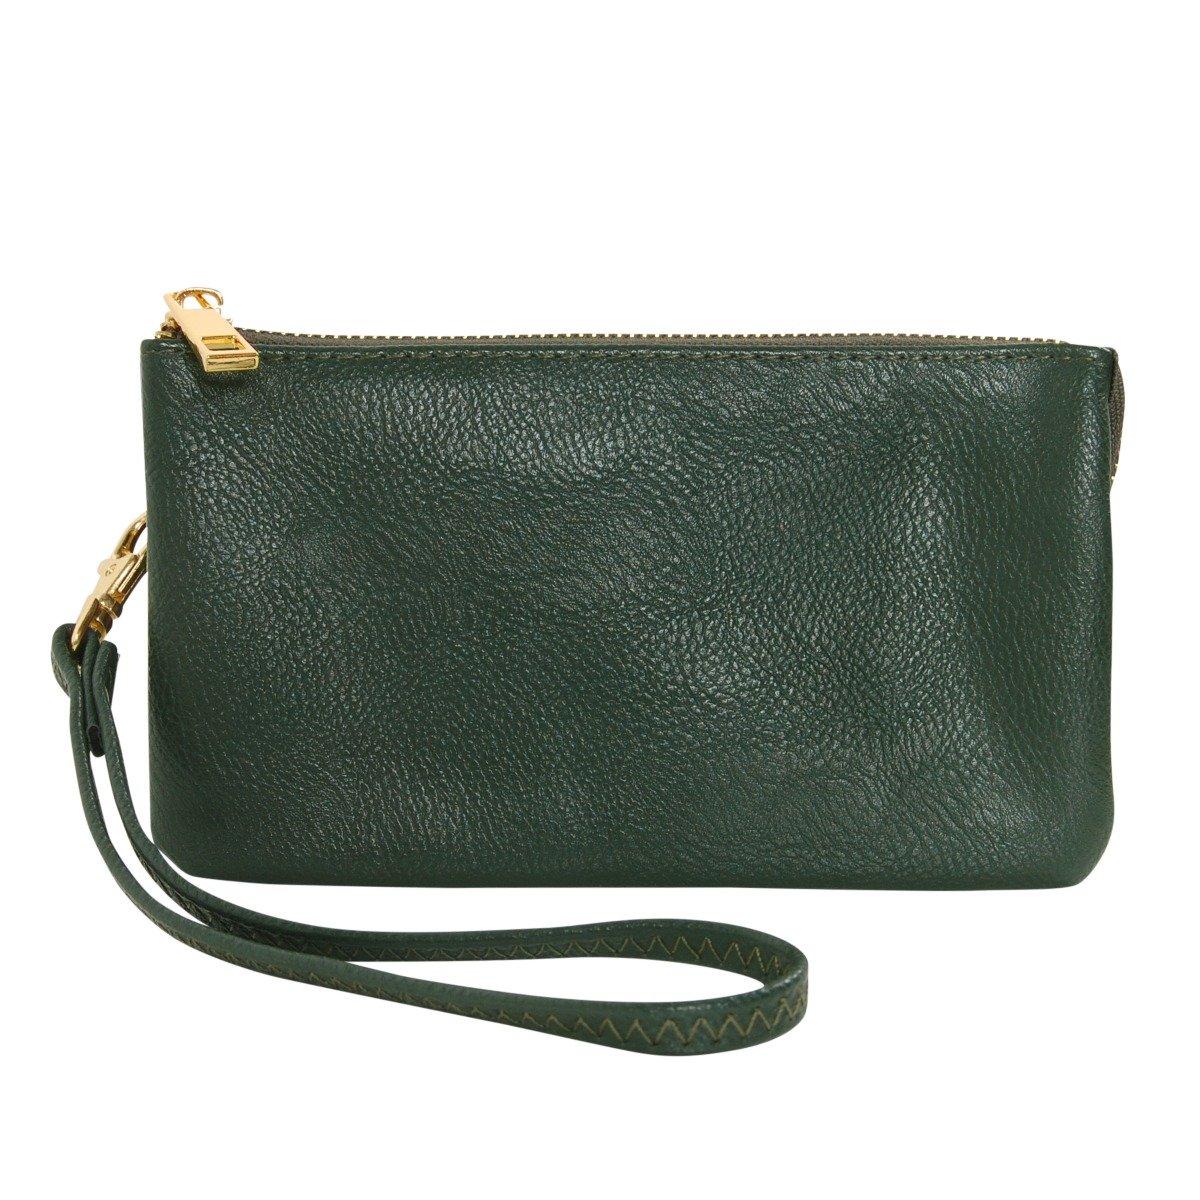 Humble Chic Vegan Leather Wristlet Wallet Clutch Bag - Small Phone Purse Handbag, Hunter Green, Dark Forest Green, Olive